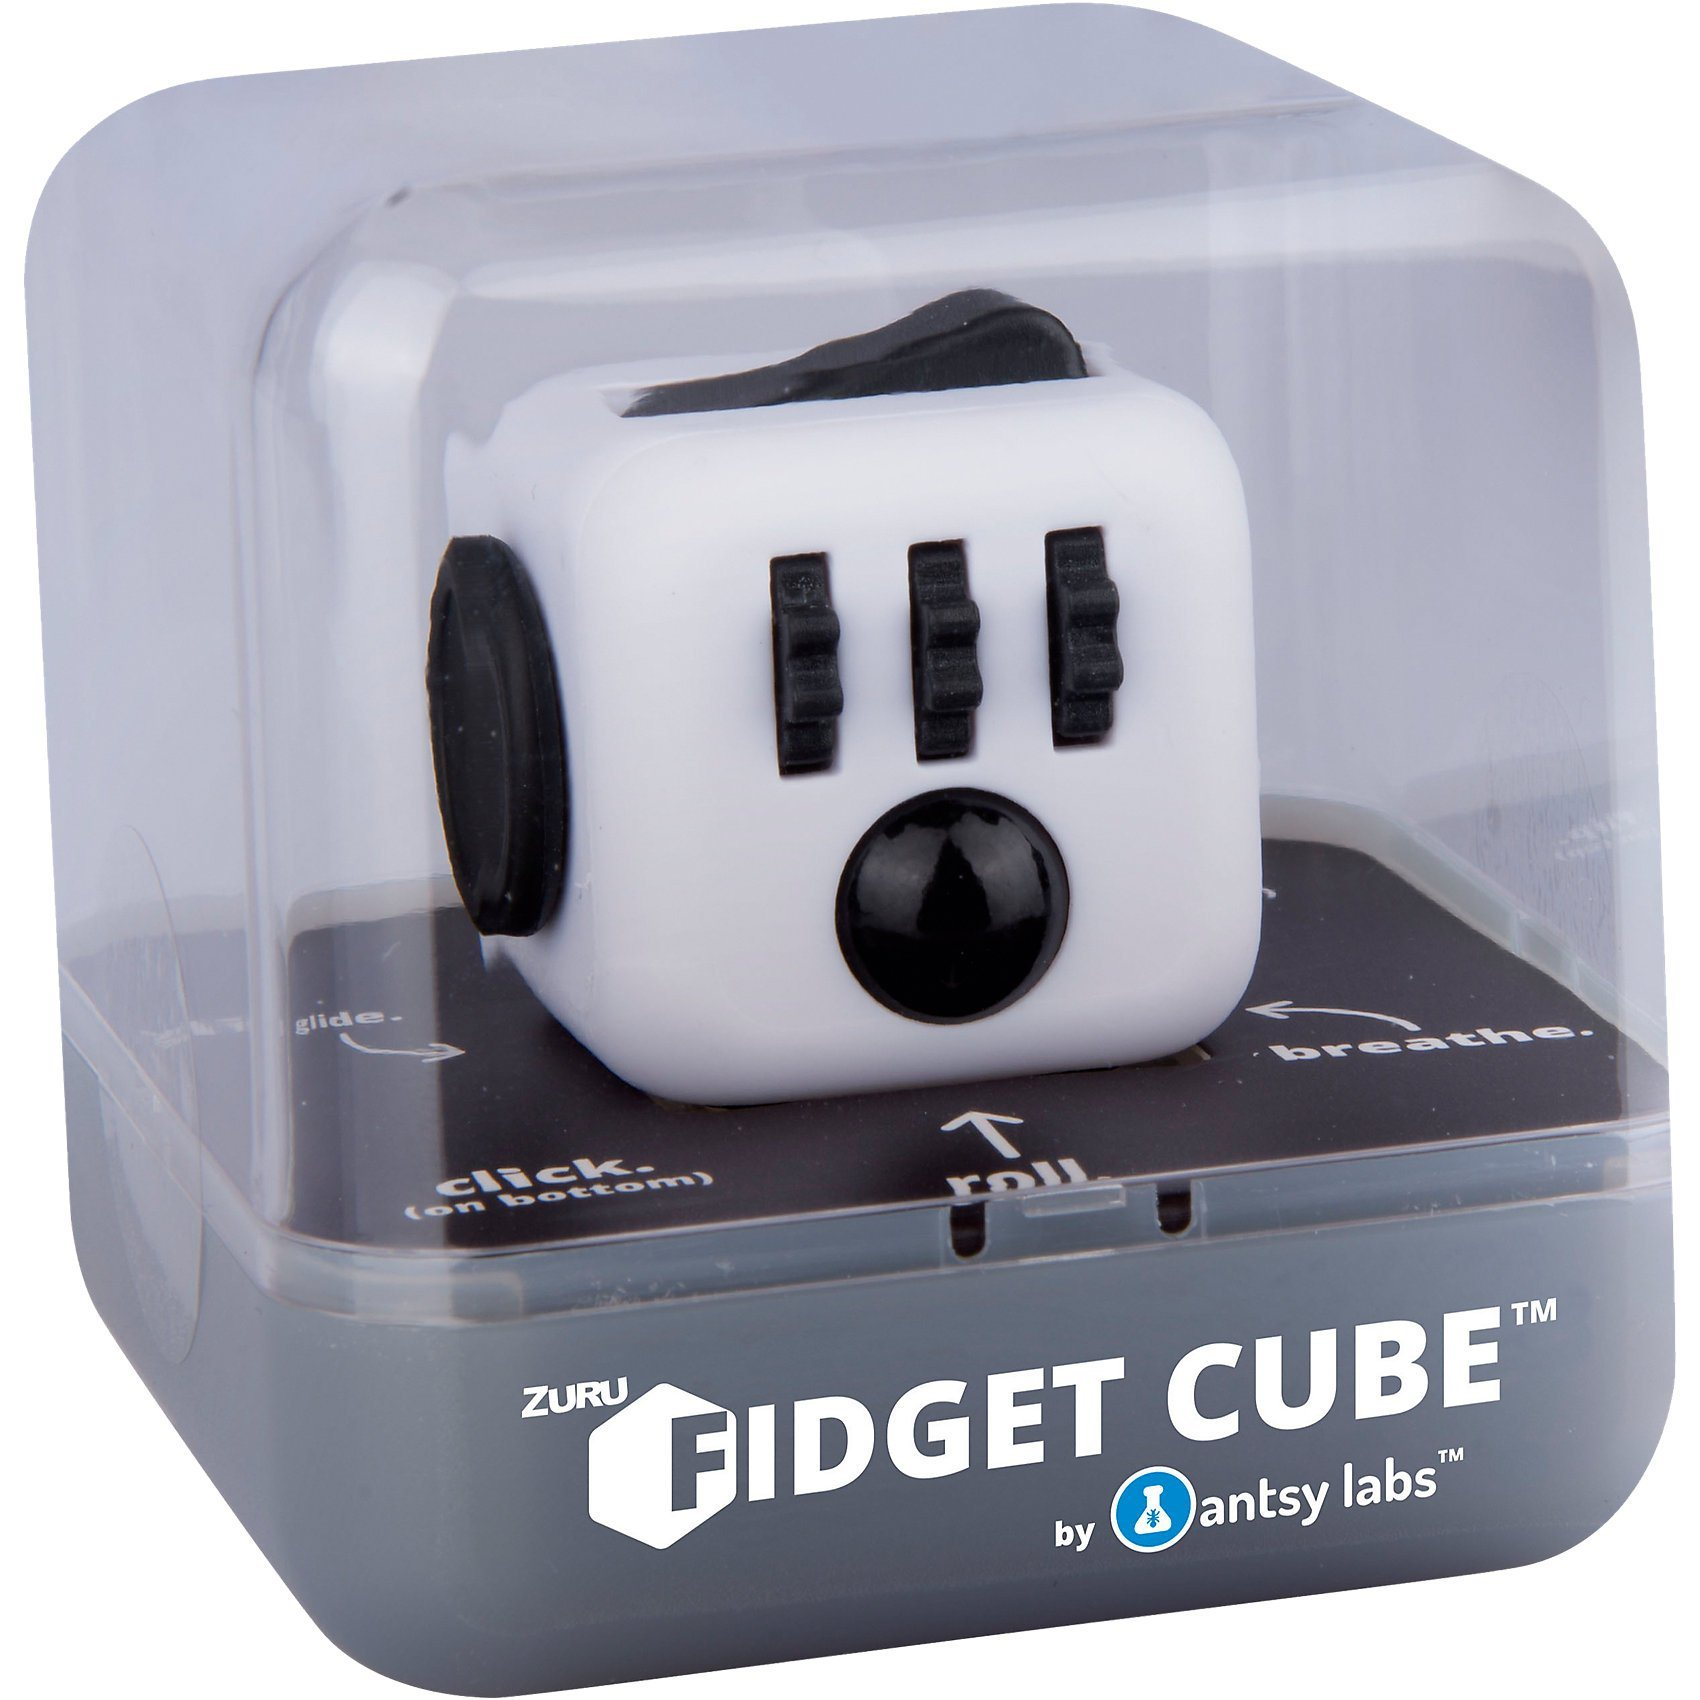 BOTI Fidget Cube - schwarz/weiß